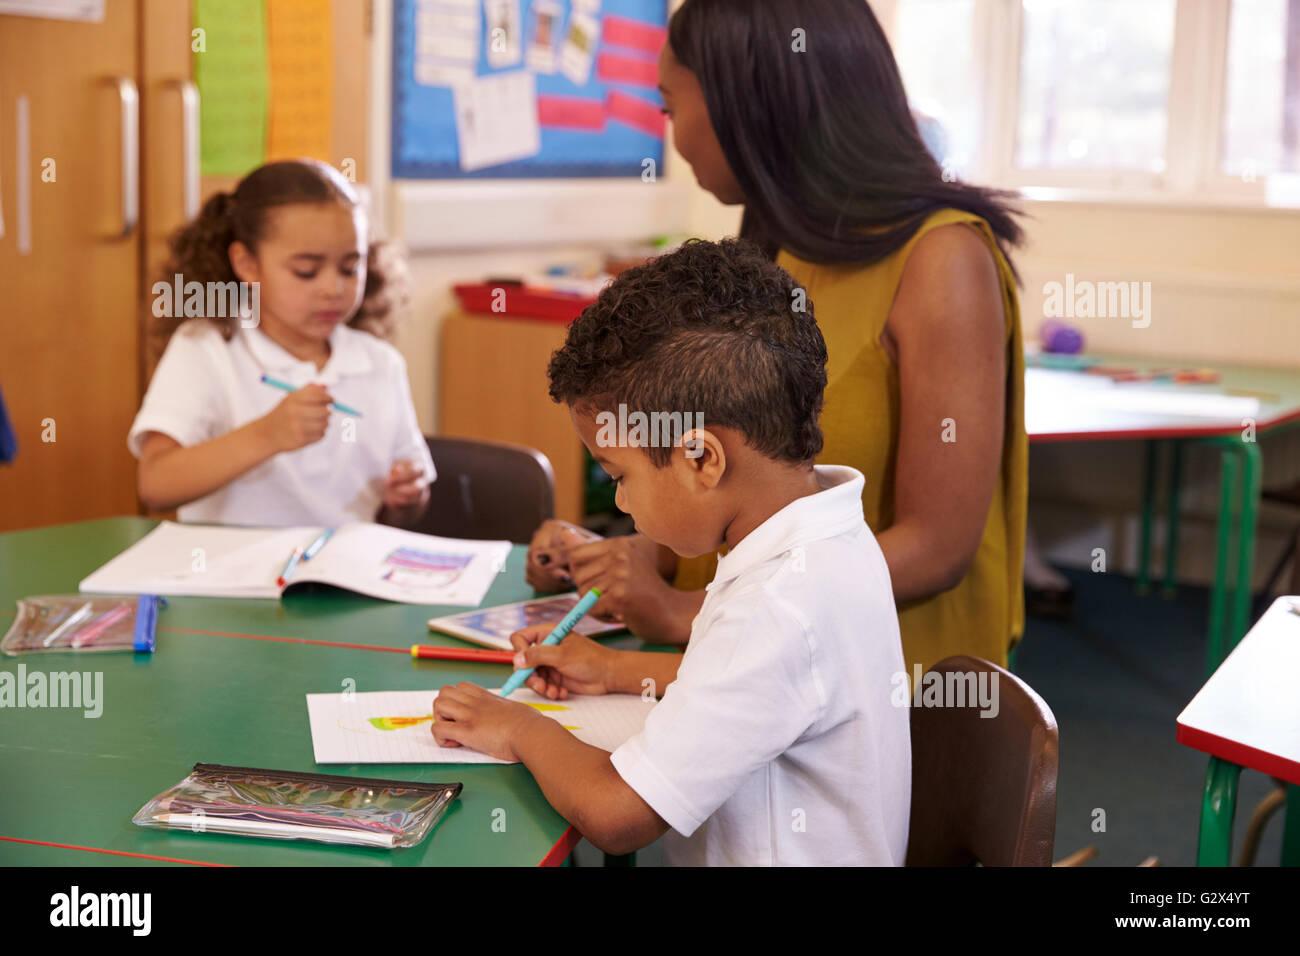 Female Elementary School Teacher Helping Pupils At Desk - Stock Image